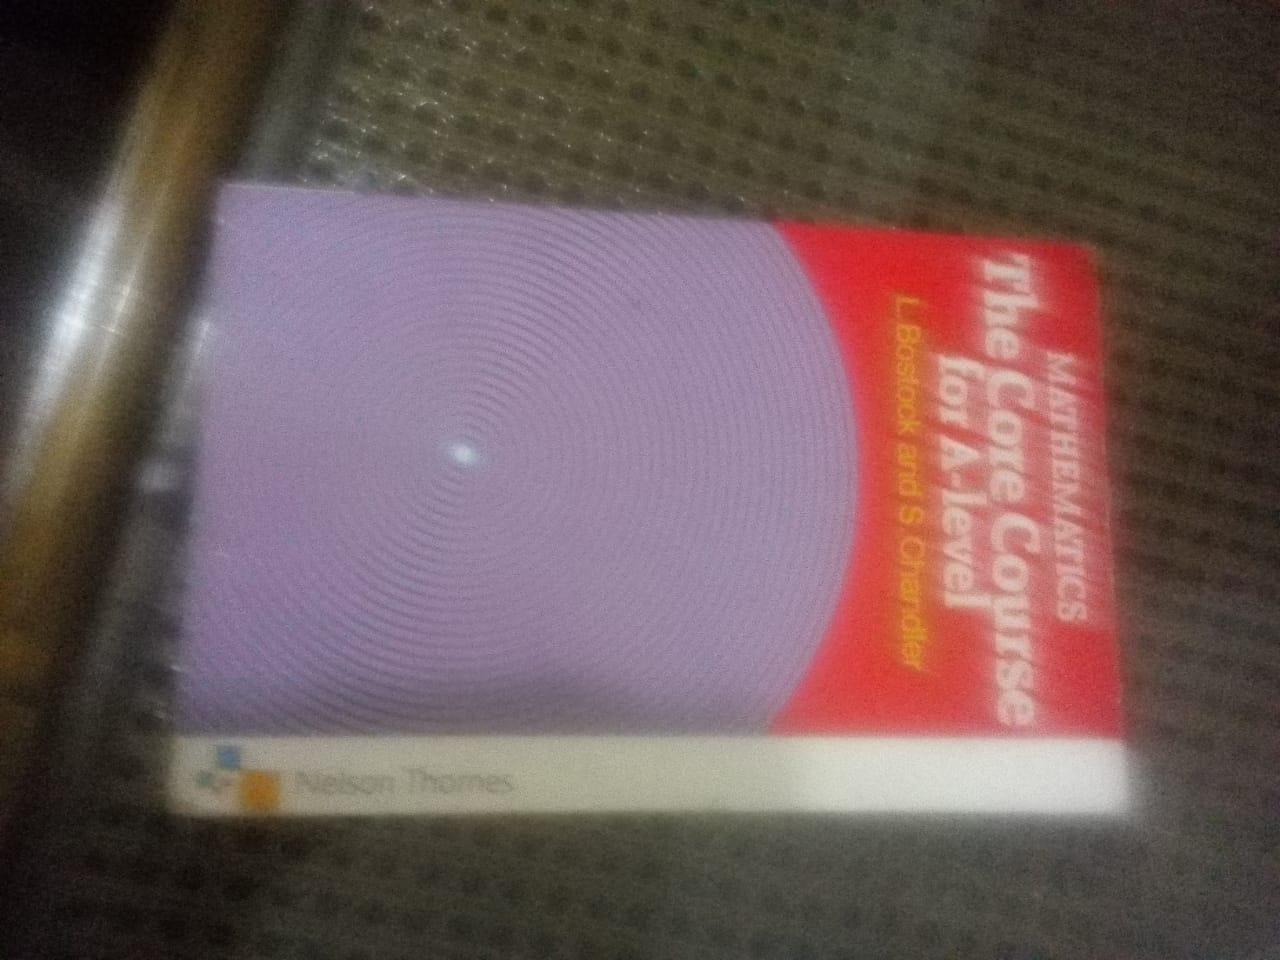 Core Course for A-level mathematics